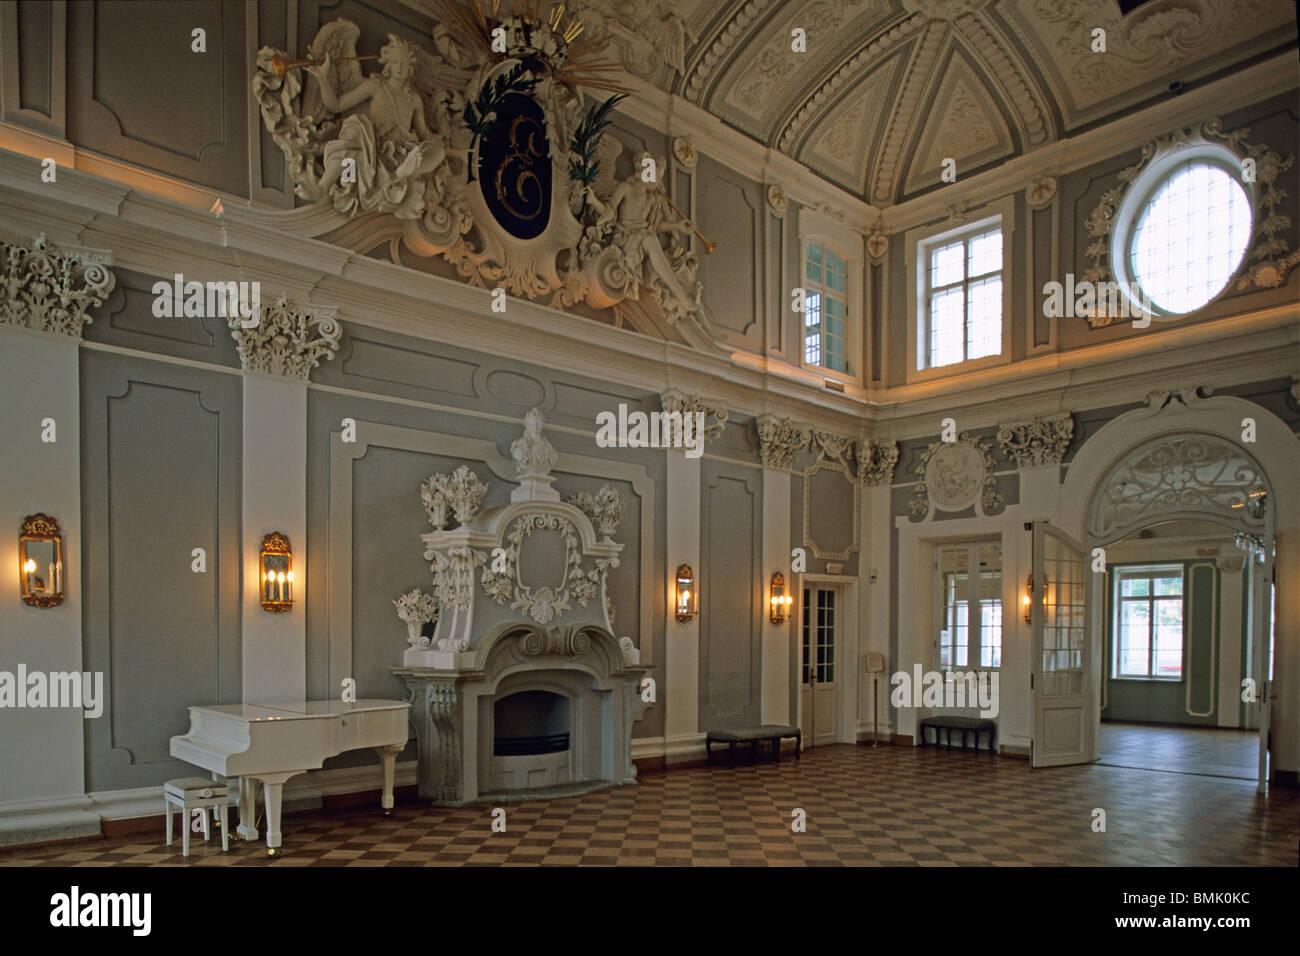 estoniatallinnkadriorg palaceinterior stock image